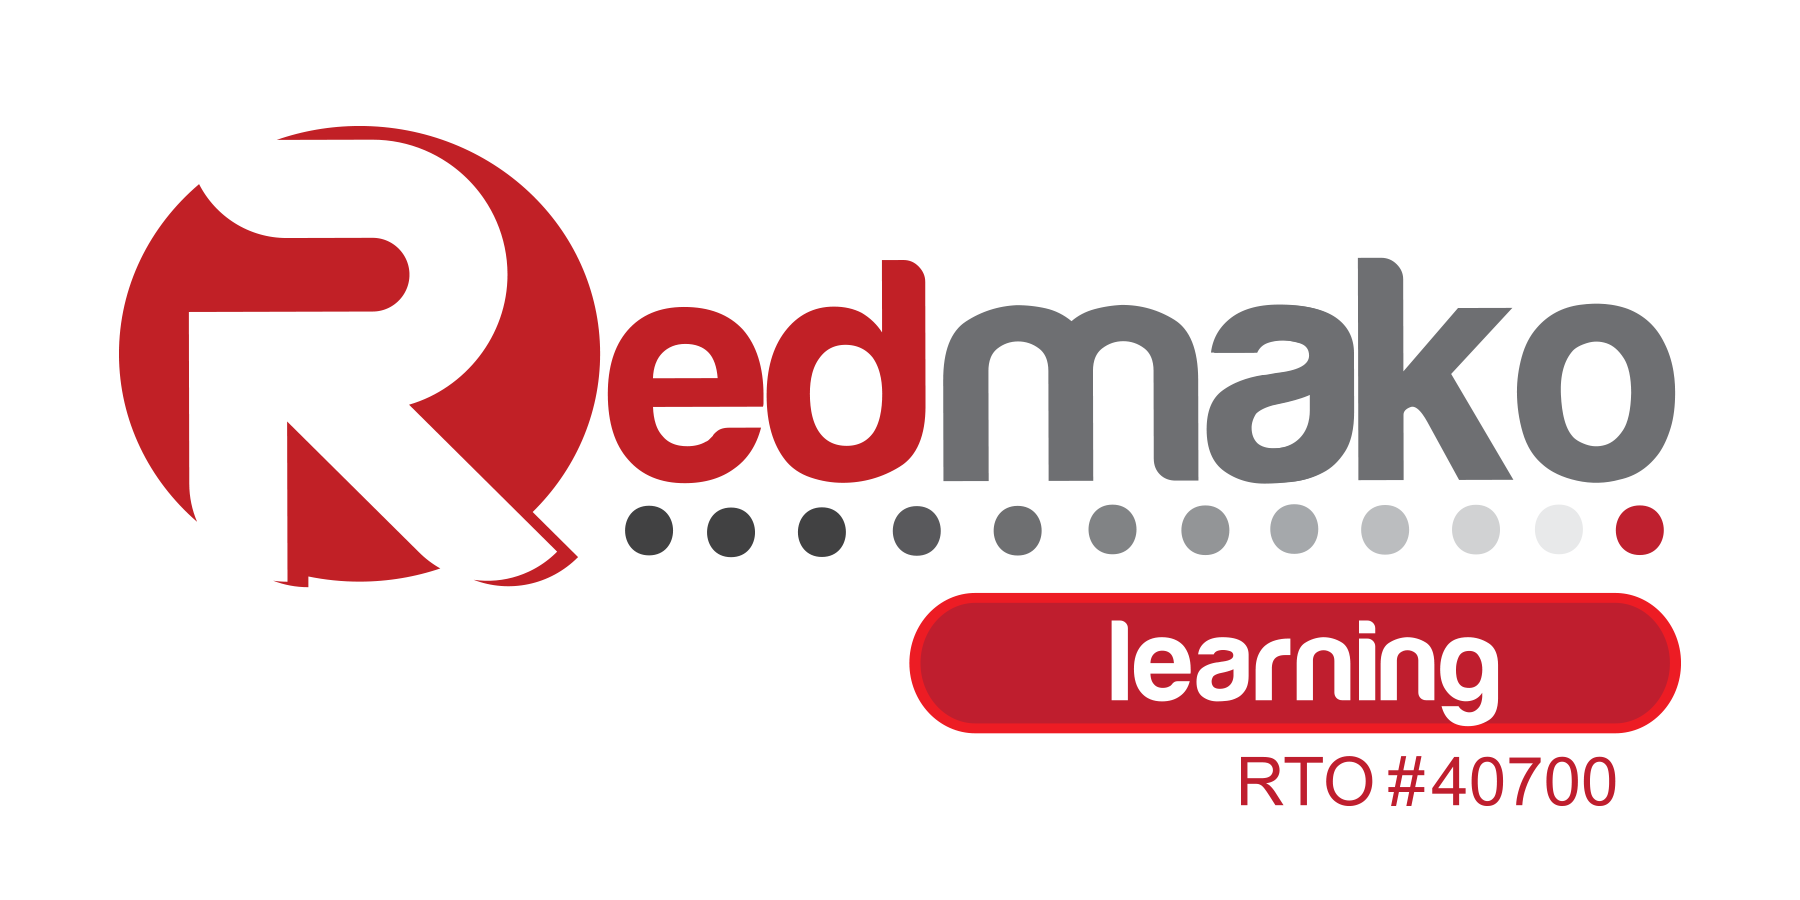 Redmako Learning